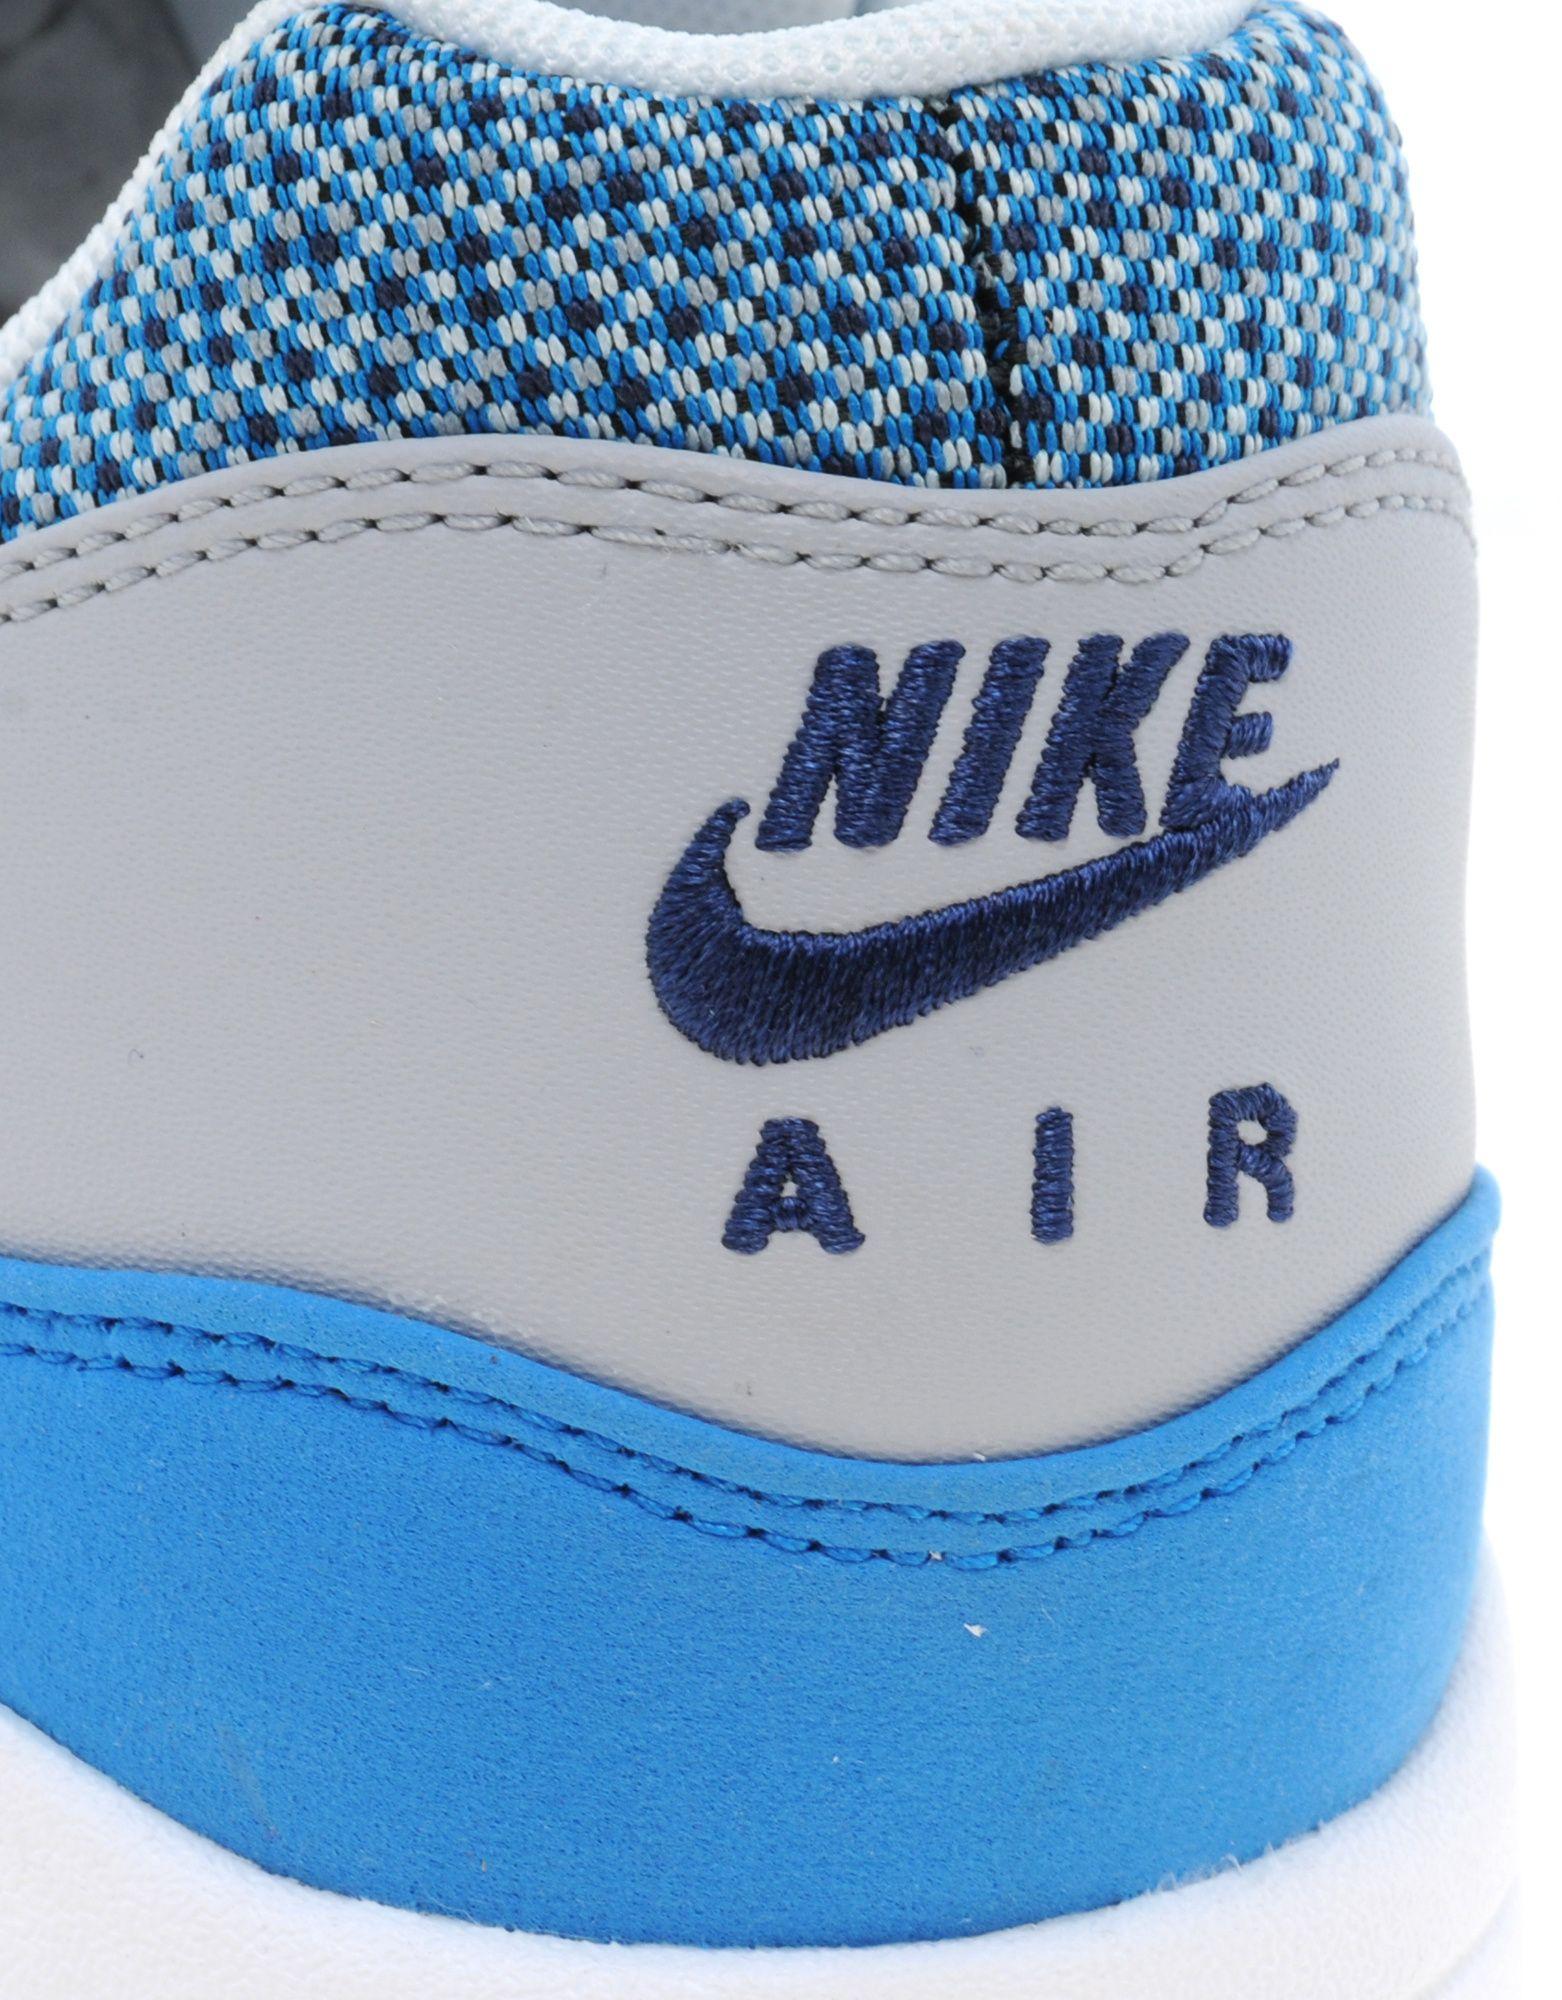 Nike Air Max 1 Jacquard